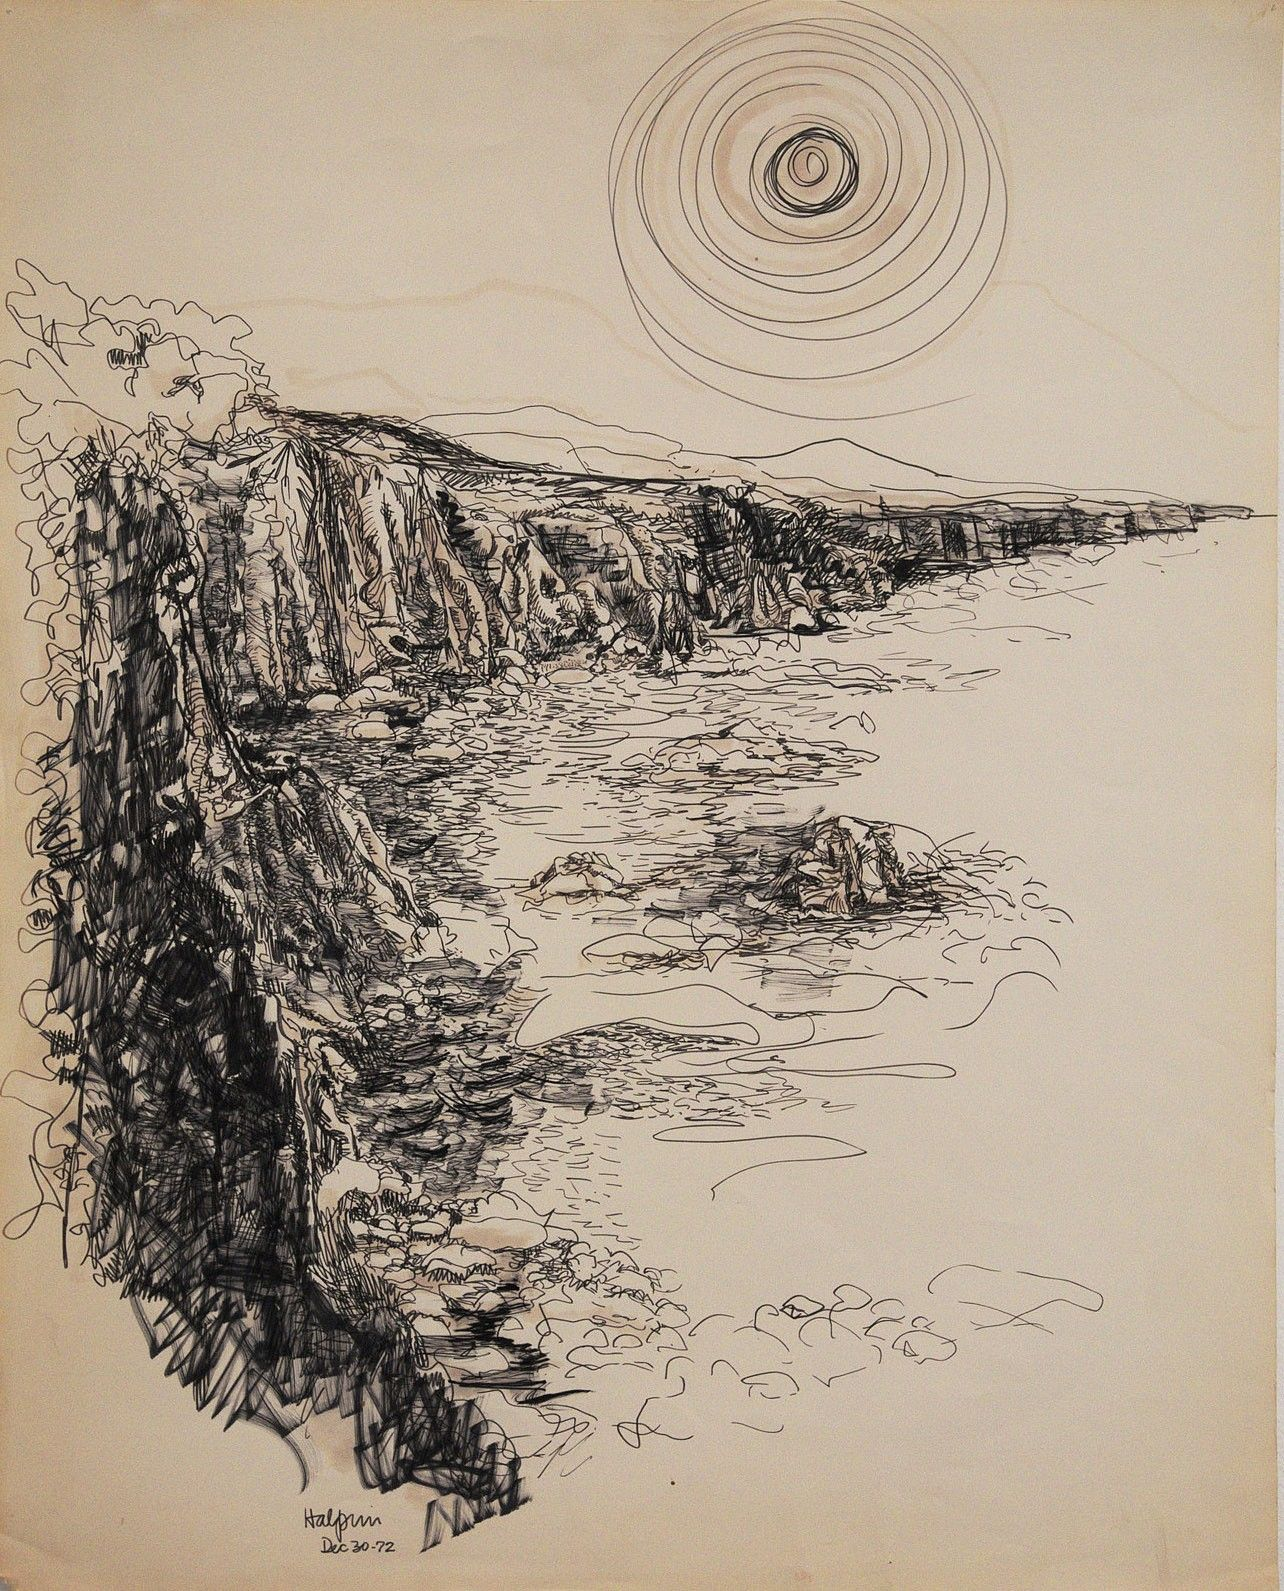 Lawrence Halprin, Sea Ranch 1972, Ink on paper